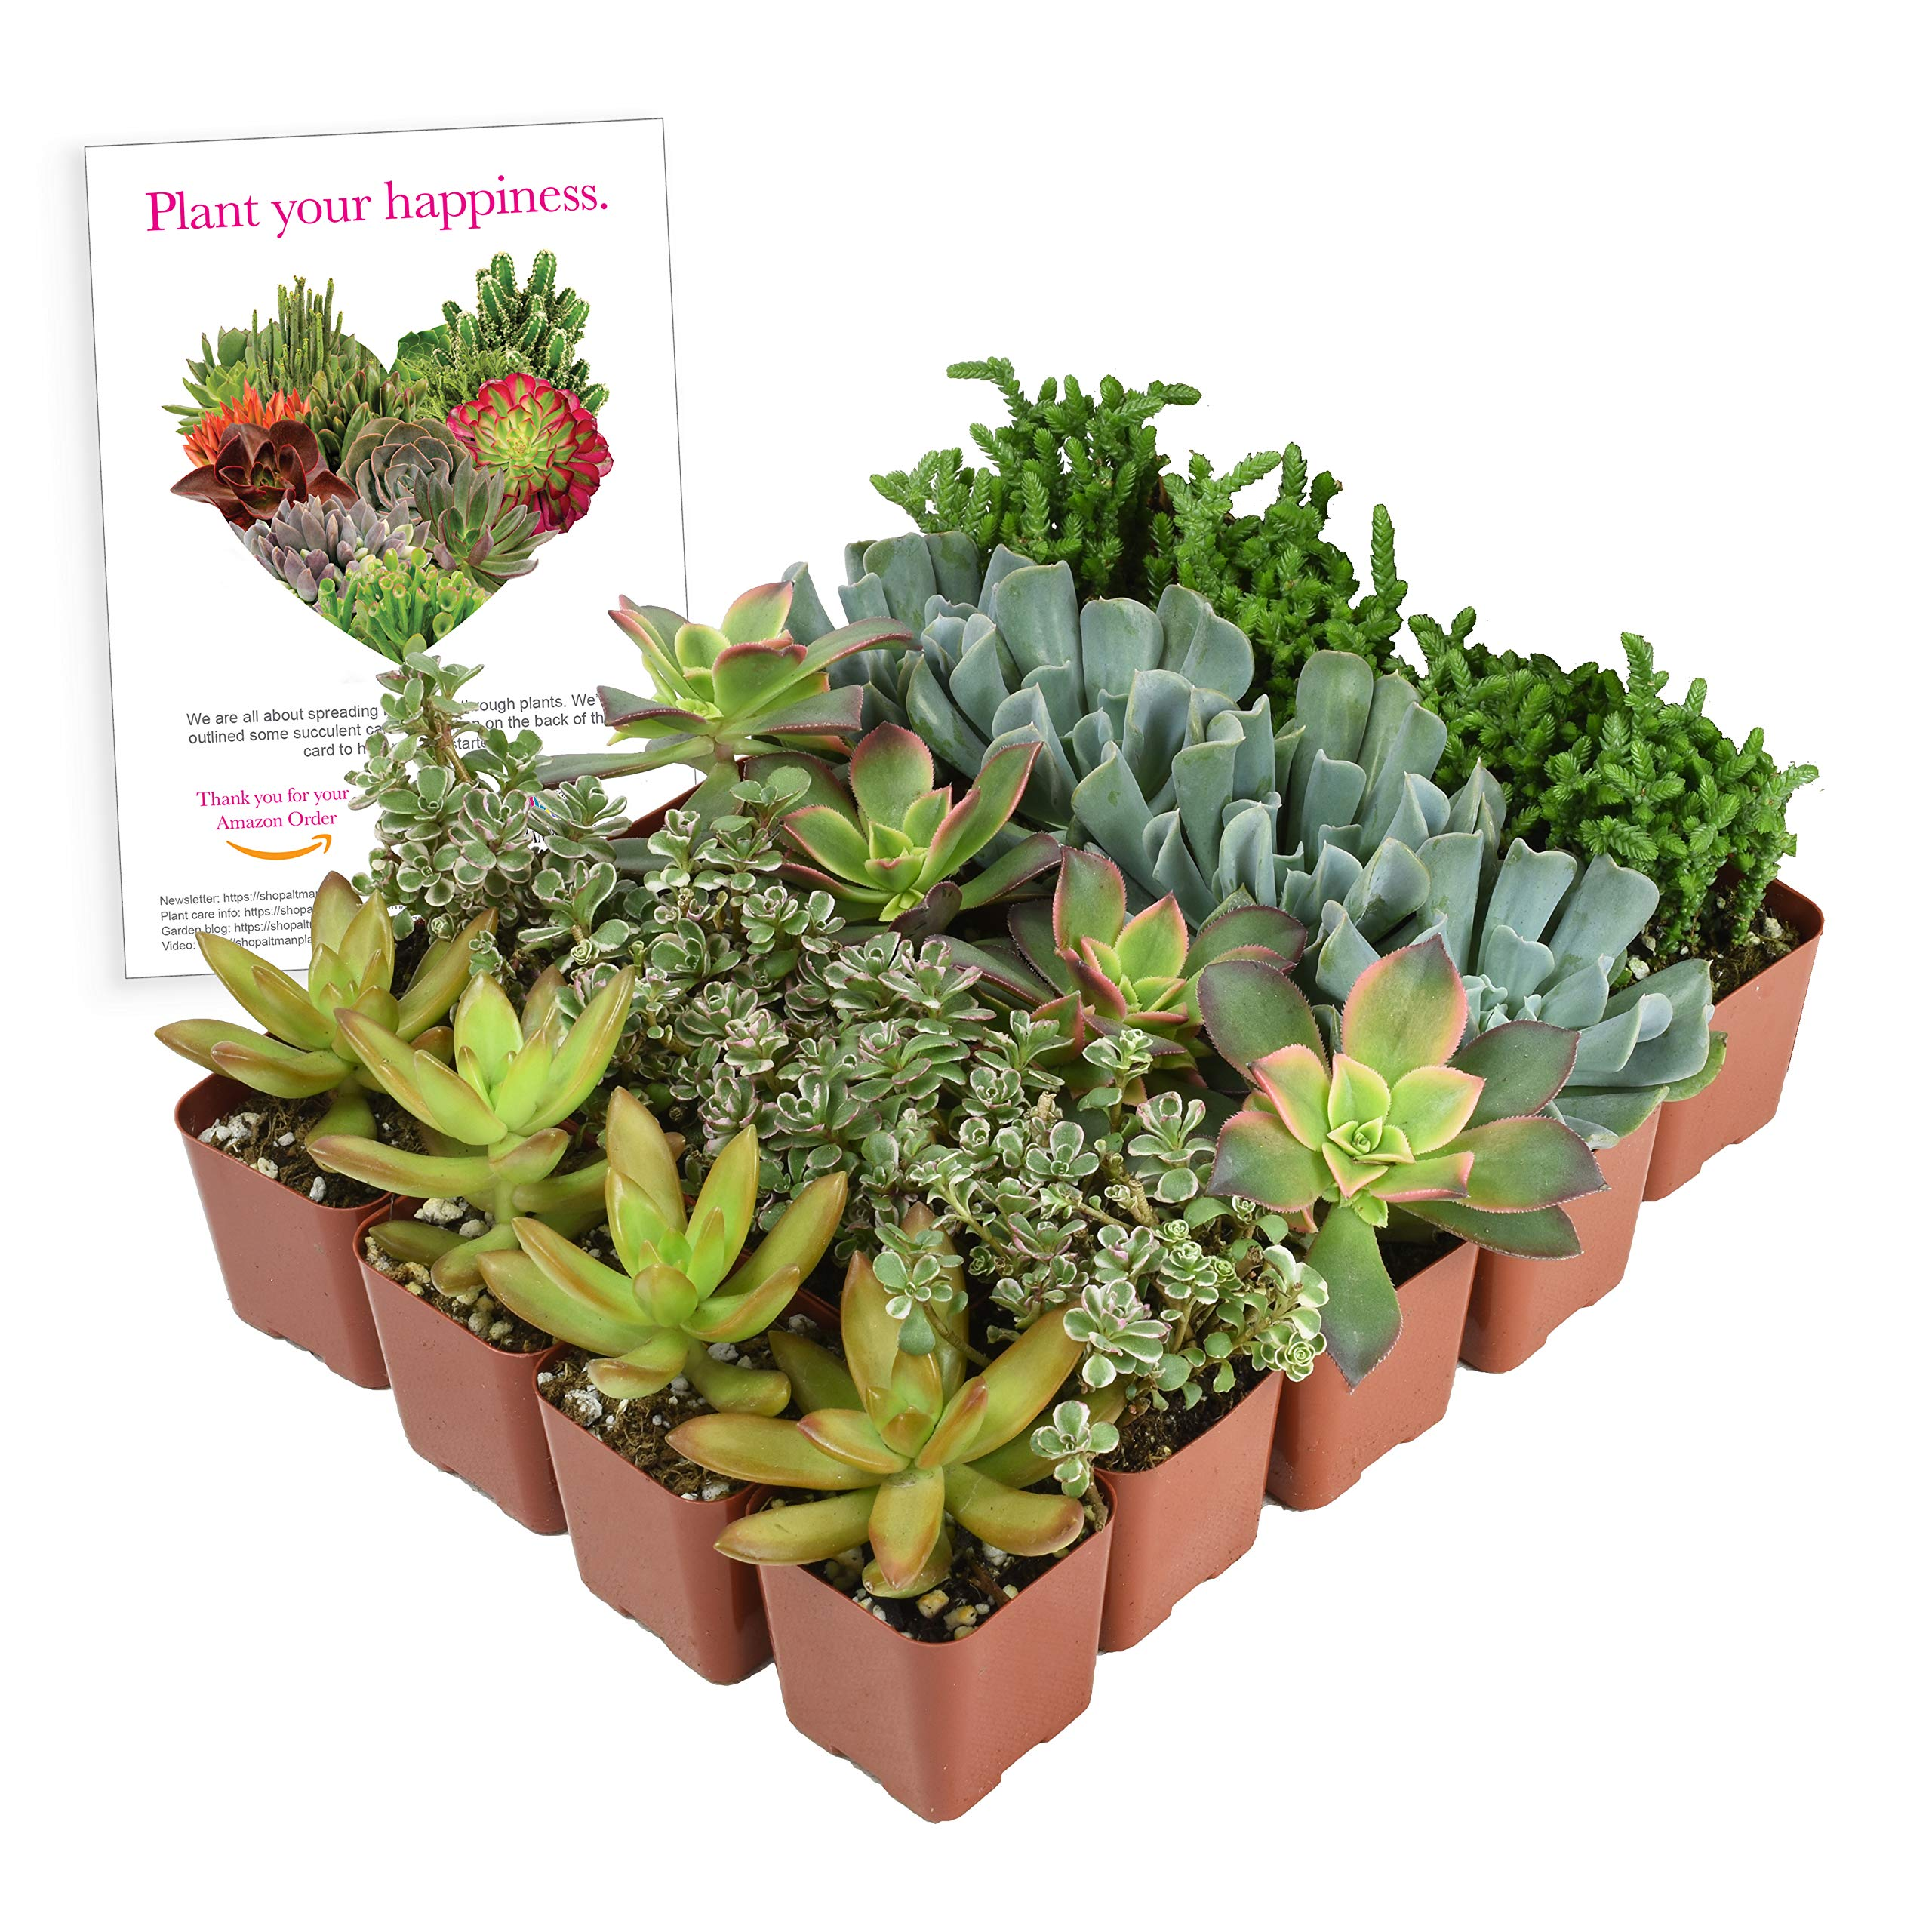 Altman Plants Mini Live Assorted Succulents Weddings, Party favors, DIY terrariums, Gifts 2'' 20 Pack